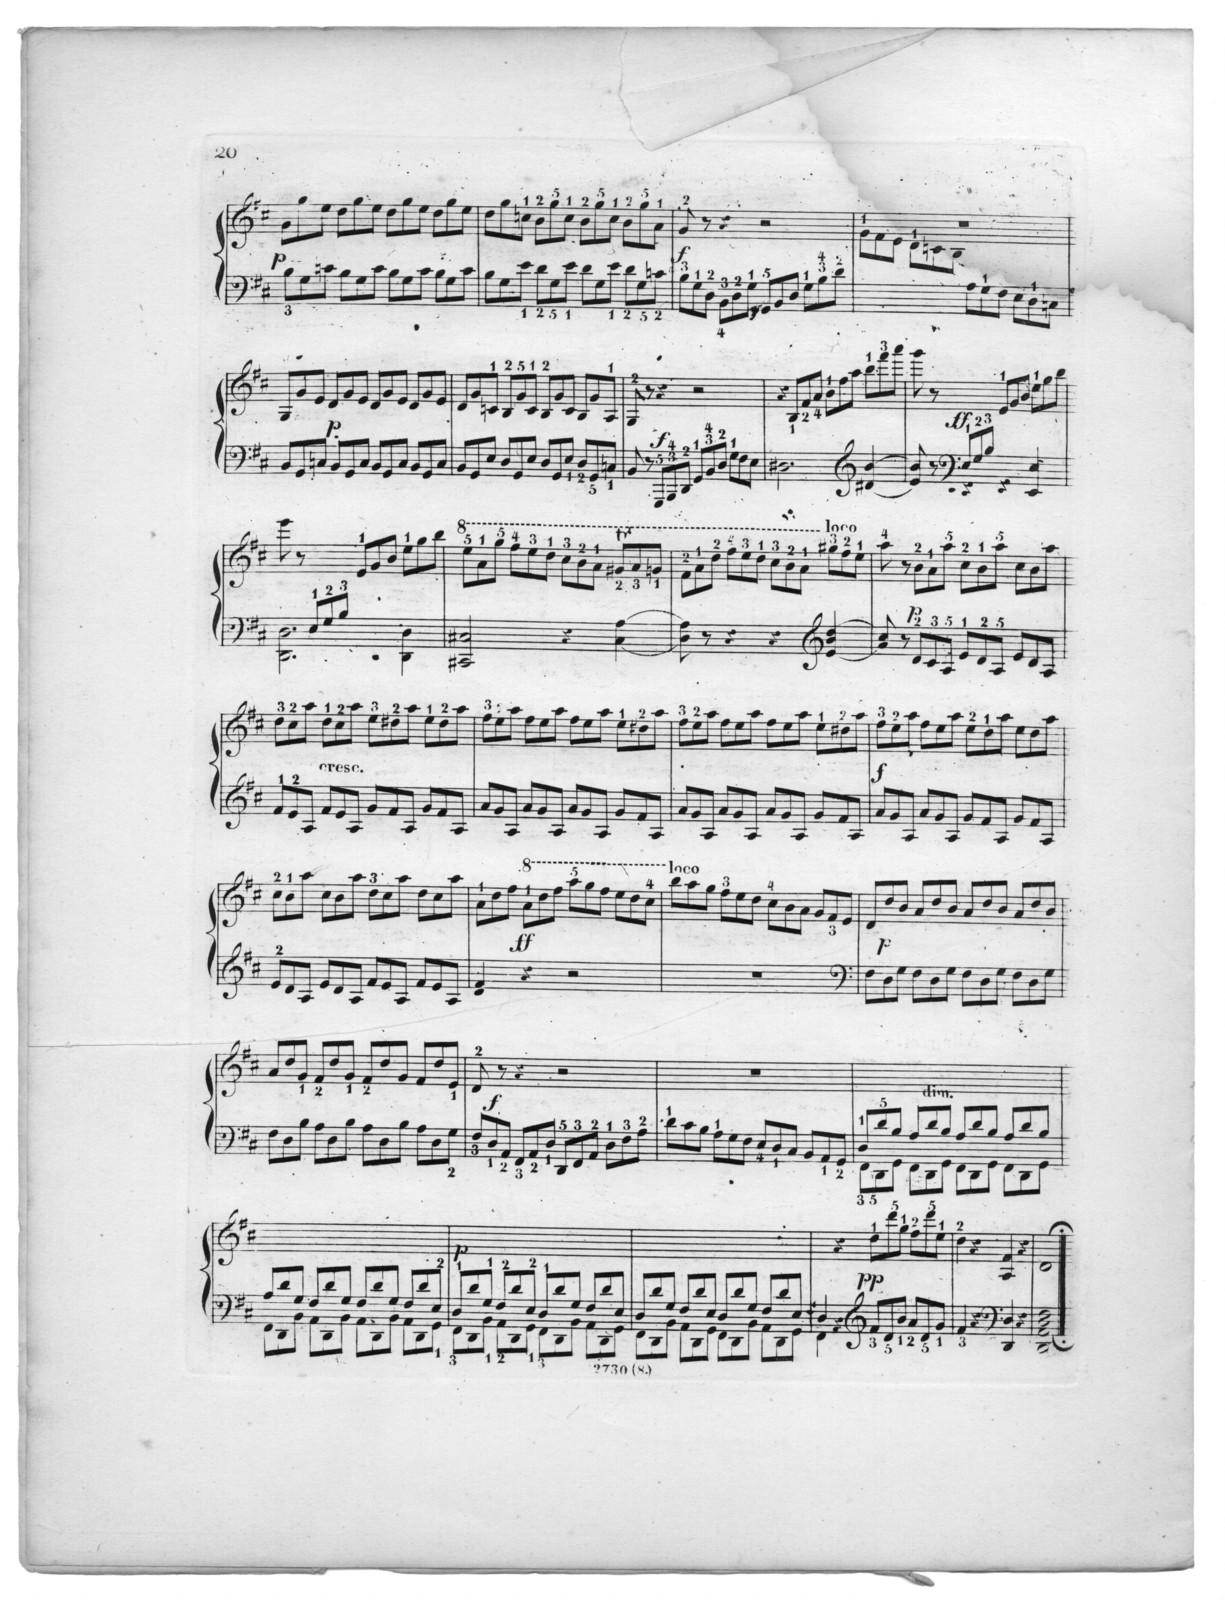 Etudes, op. 32, no. 25-48